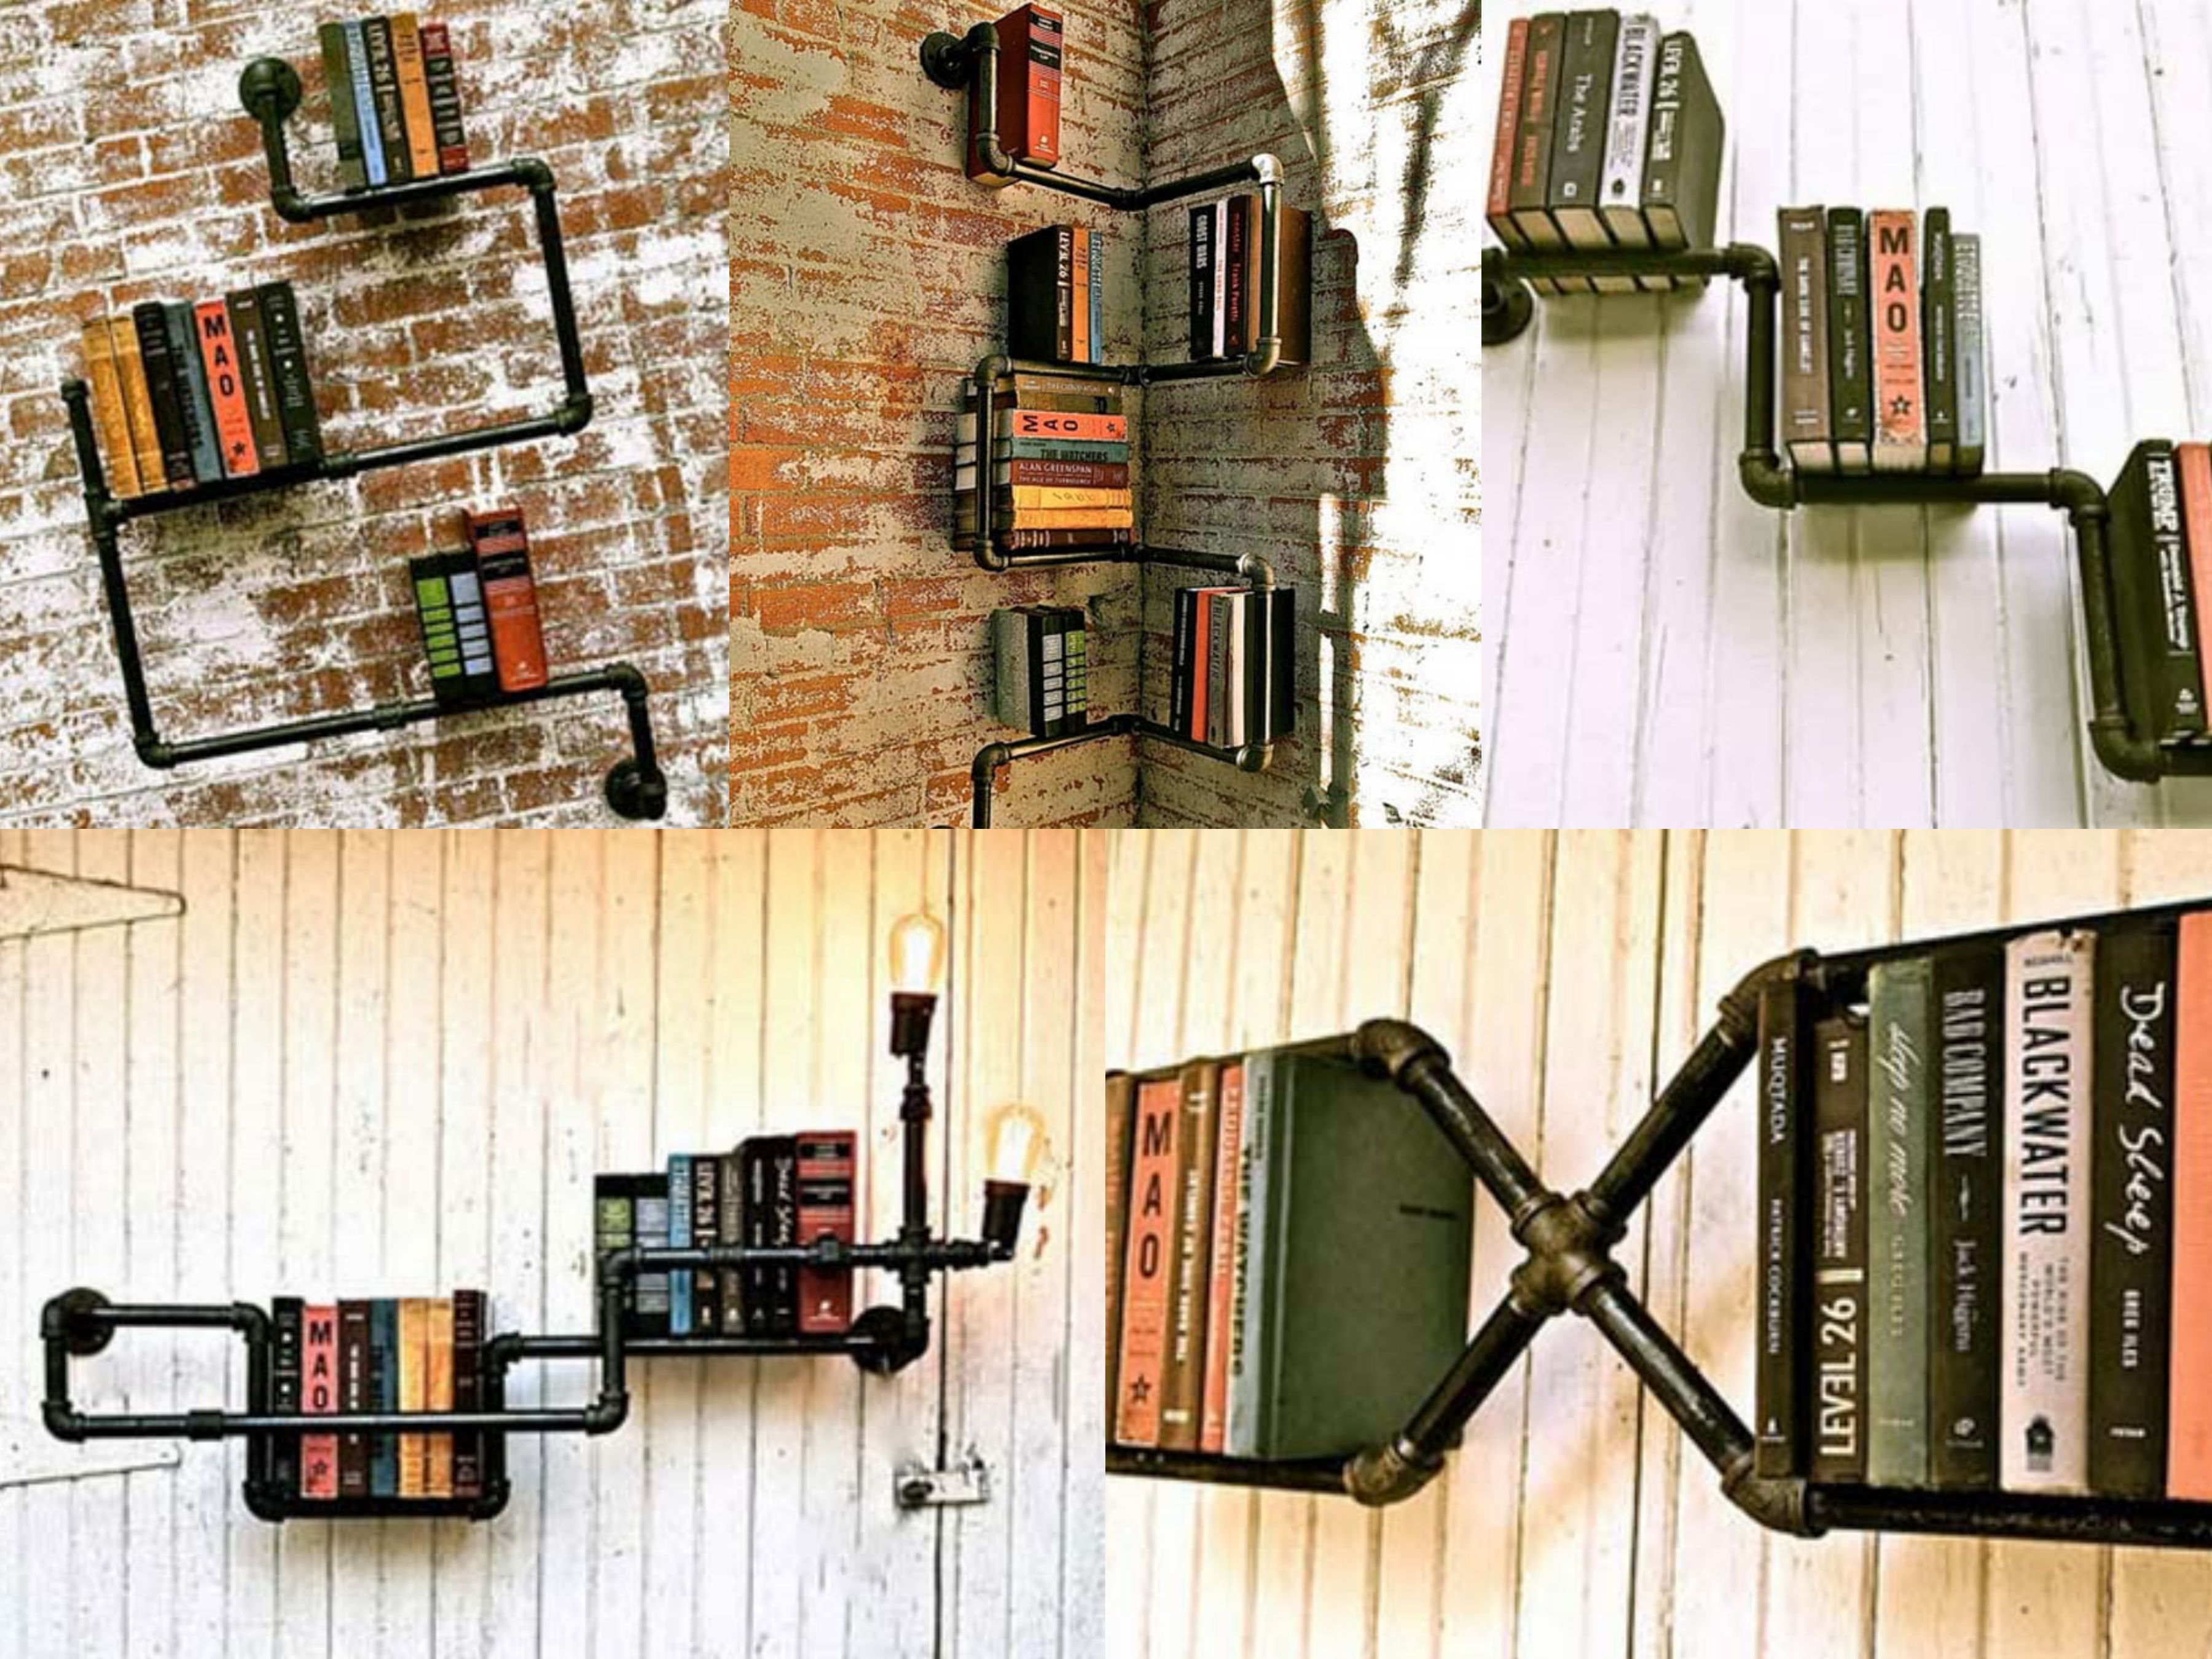 iron-pipe-book-shelf-2_Fotor_Collage